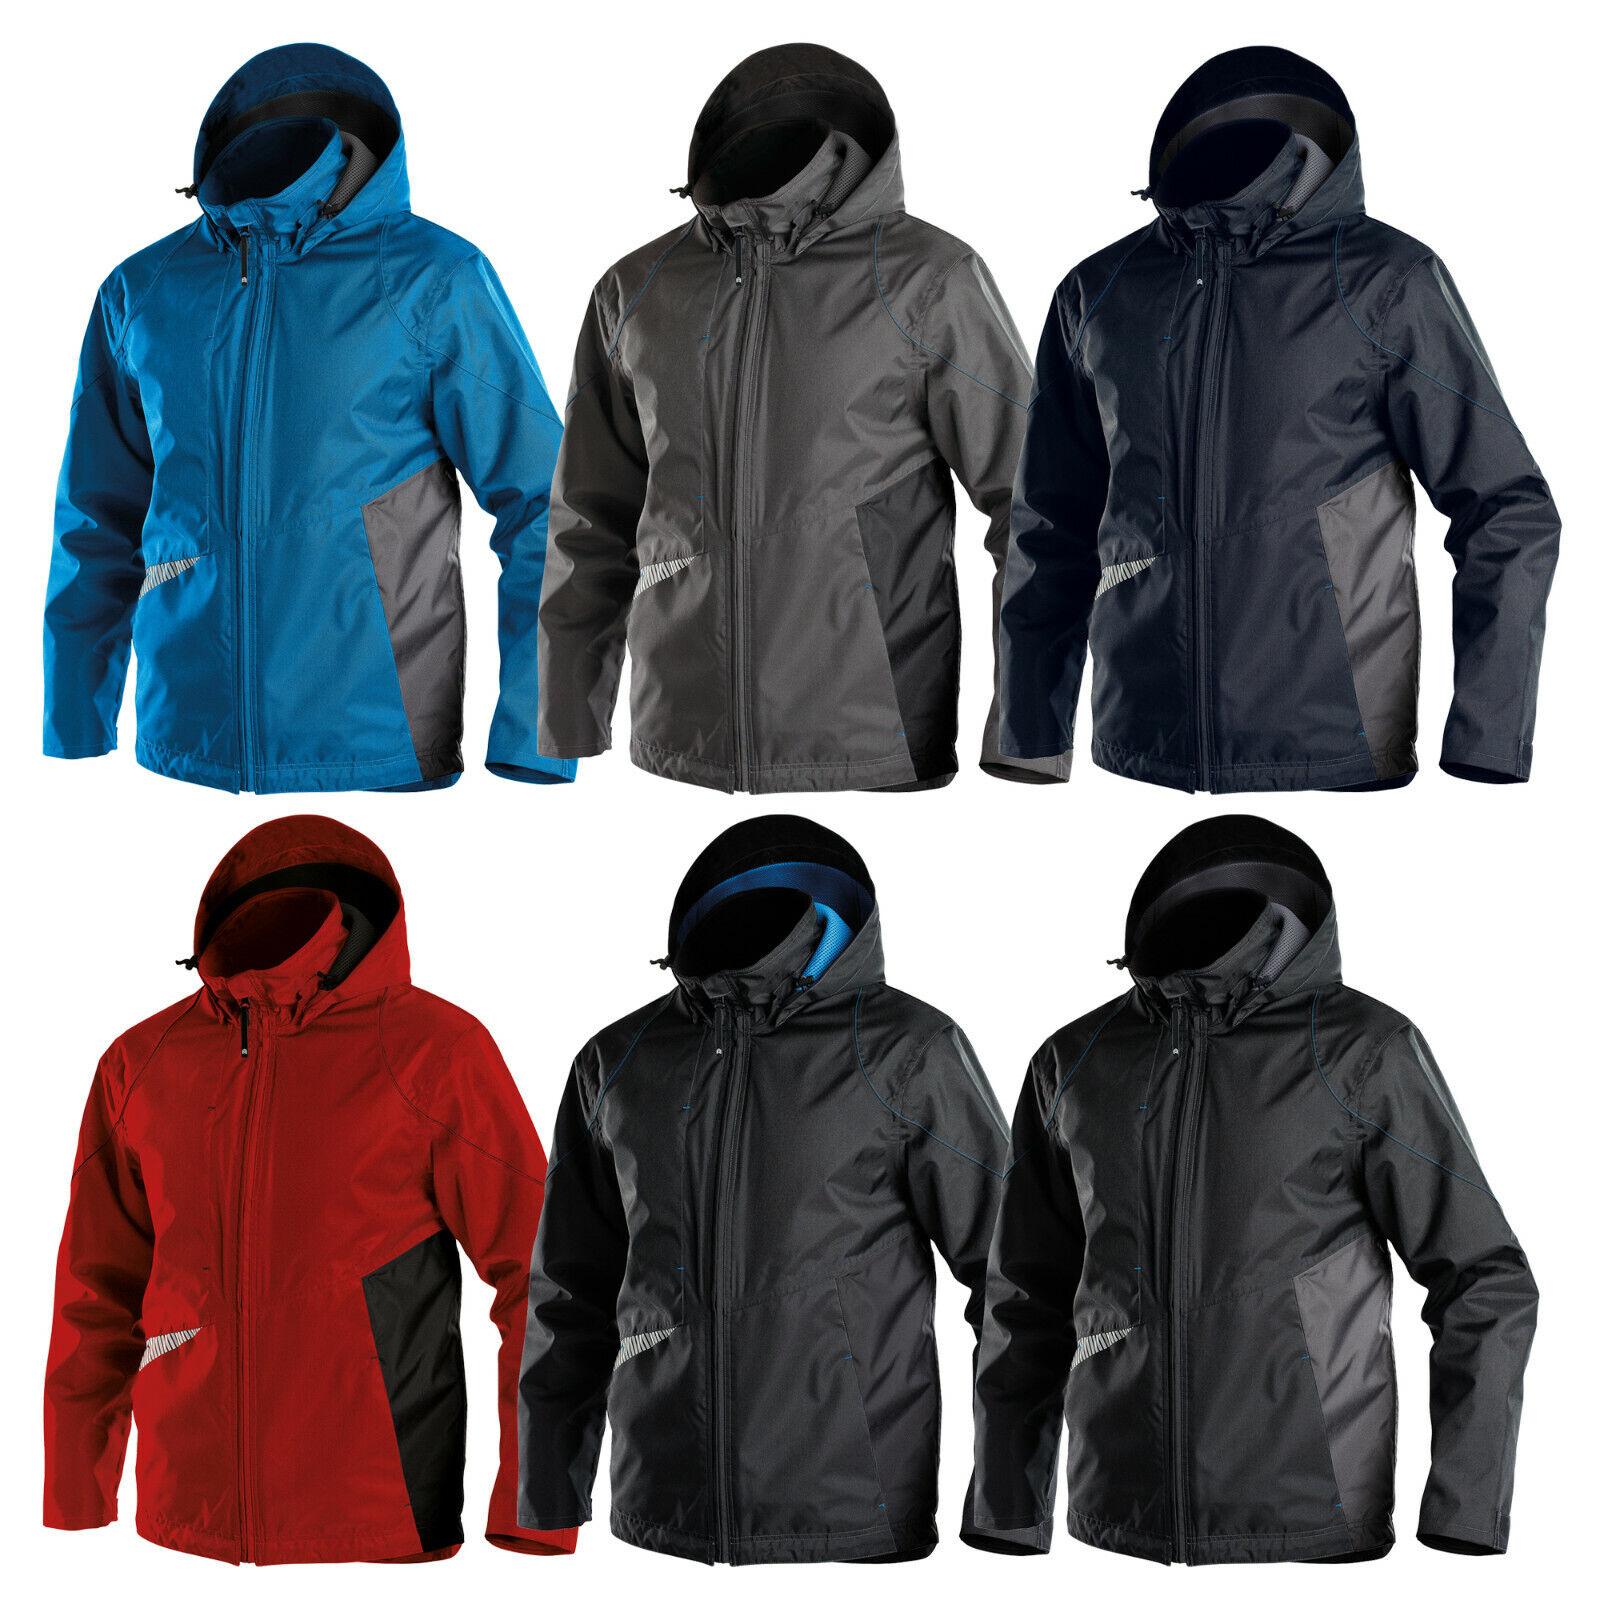 DASSY Hyper Wasserdichte Jacke Arbeitsjacke Regenjacke Workwear Regenkleidung